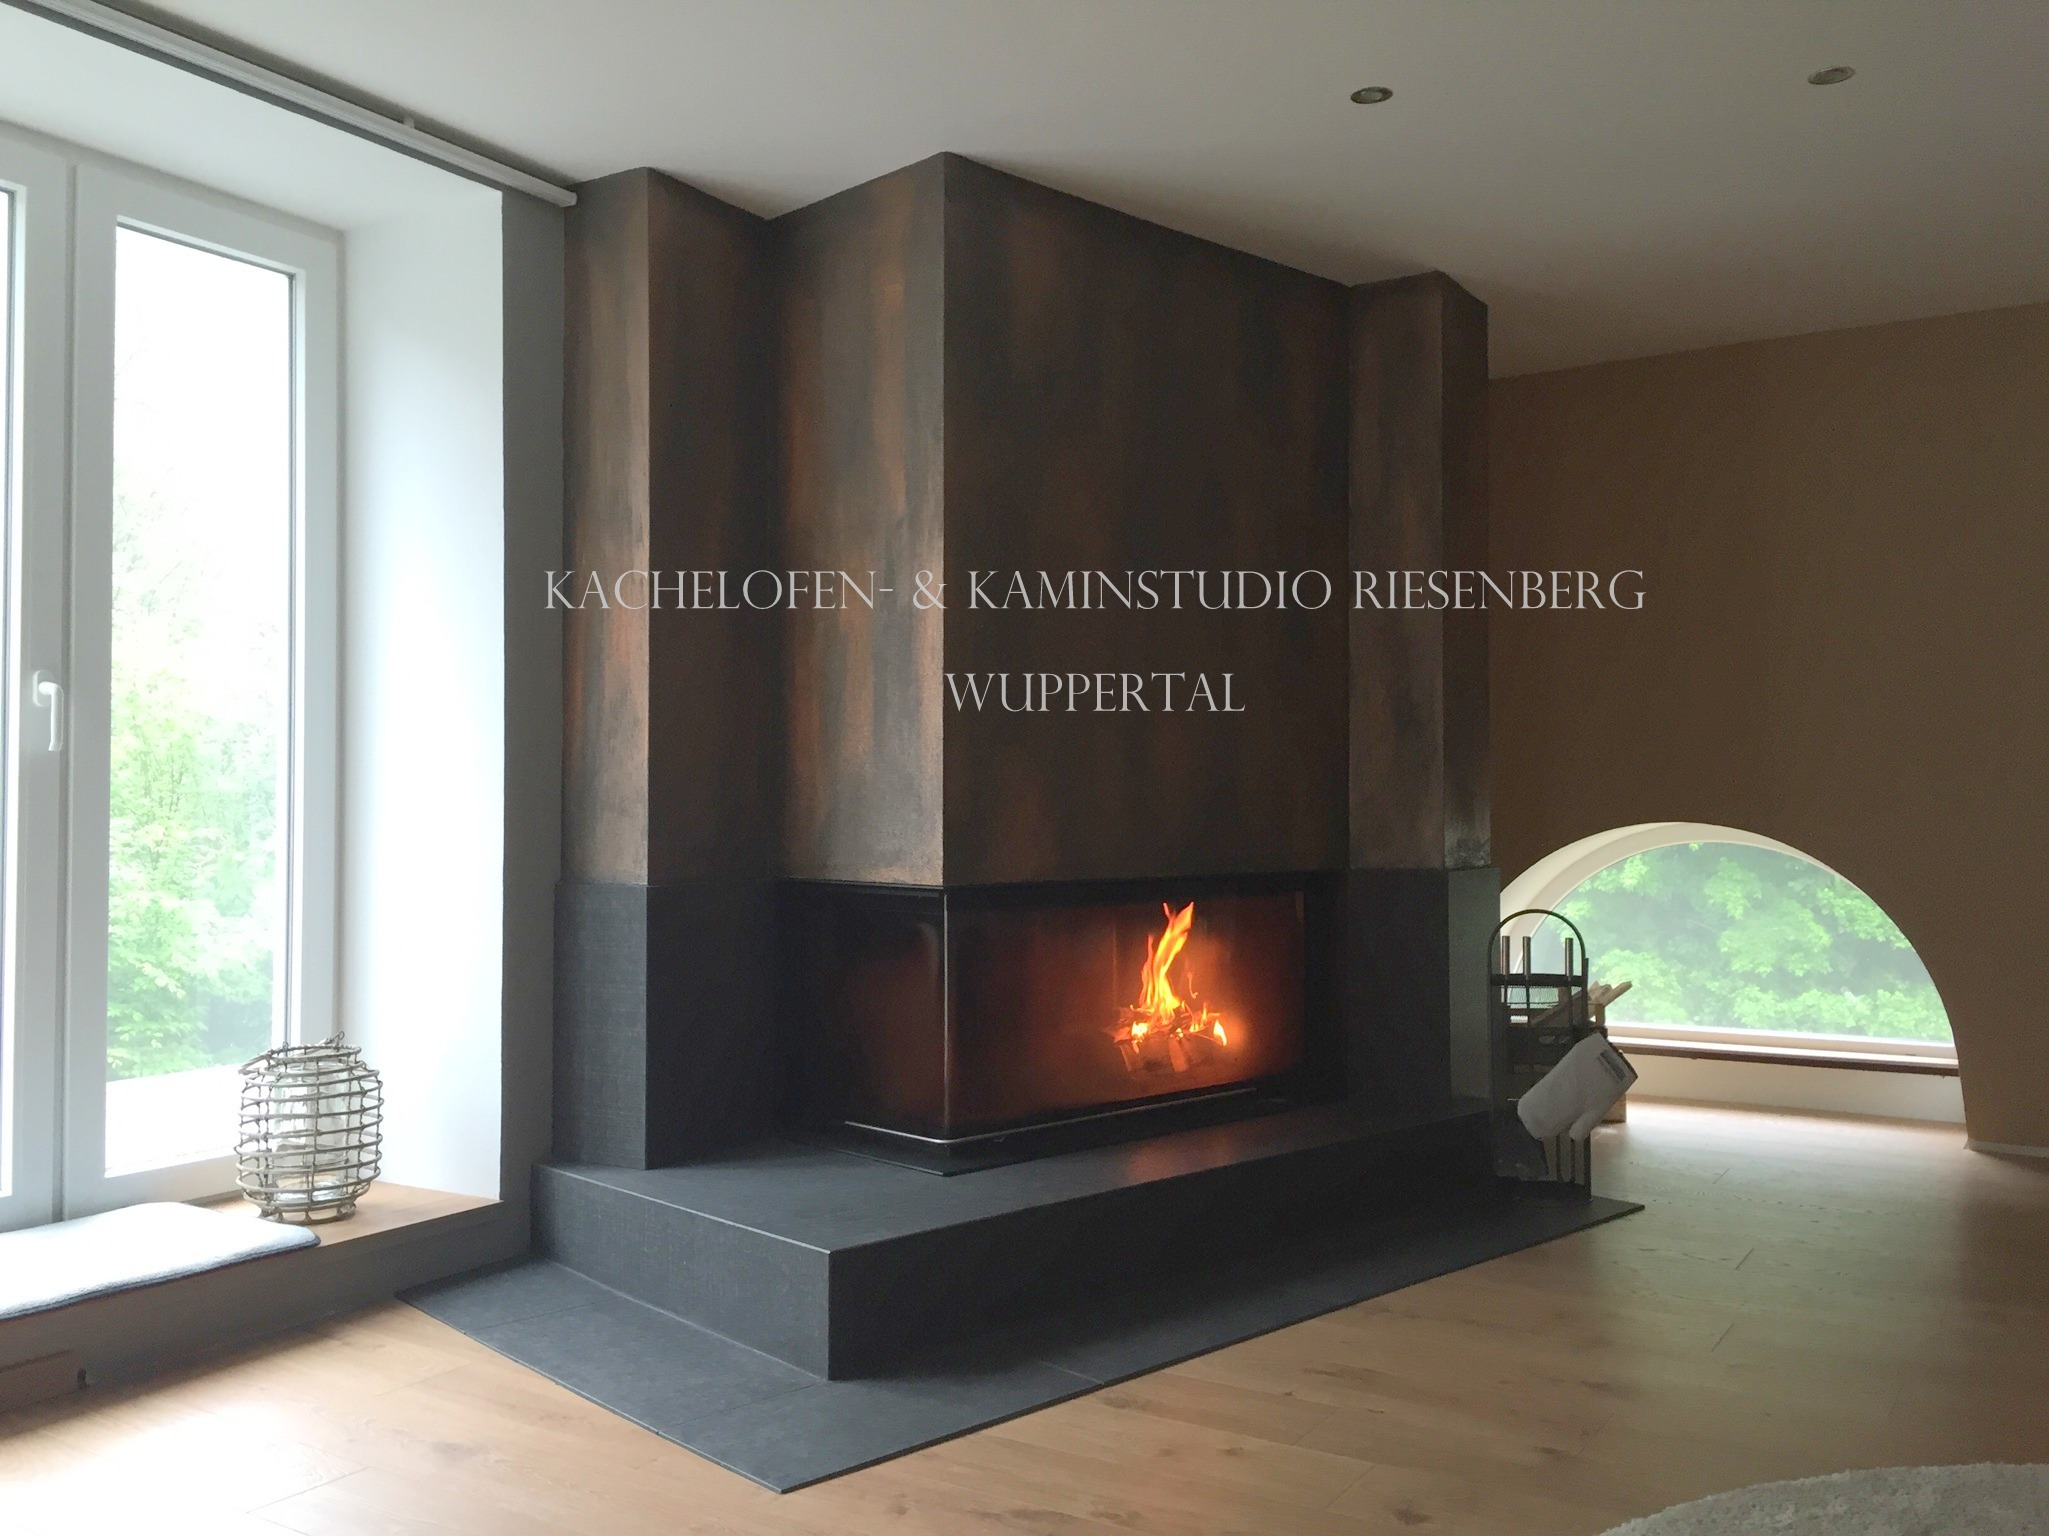 kachelofen wuppertal bildersammlung zum. Black Bedroom Furniture Sets. Home Design Ideas